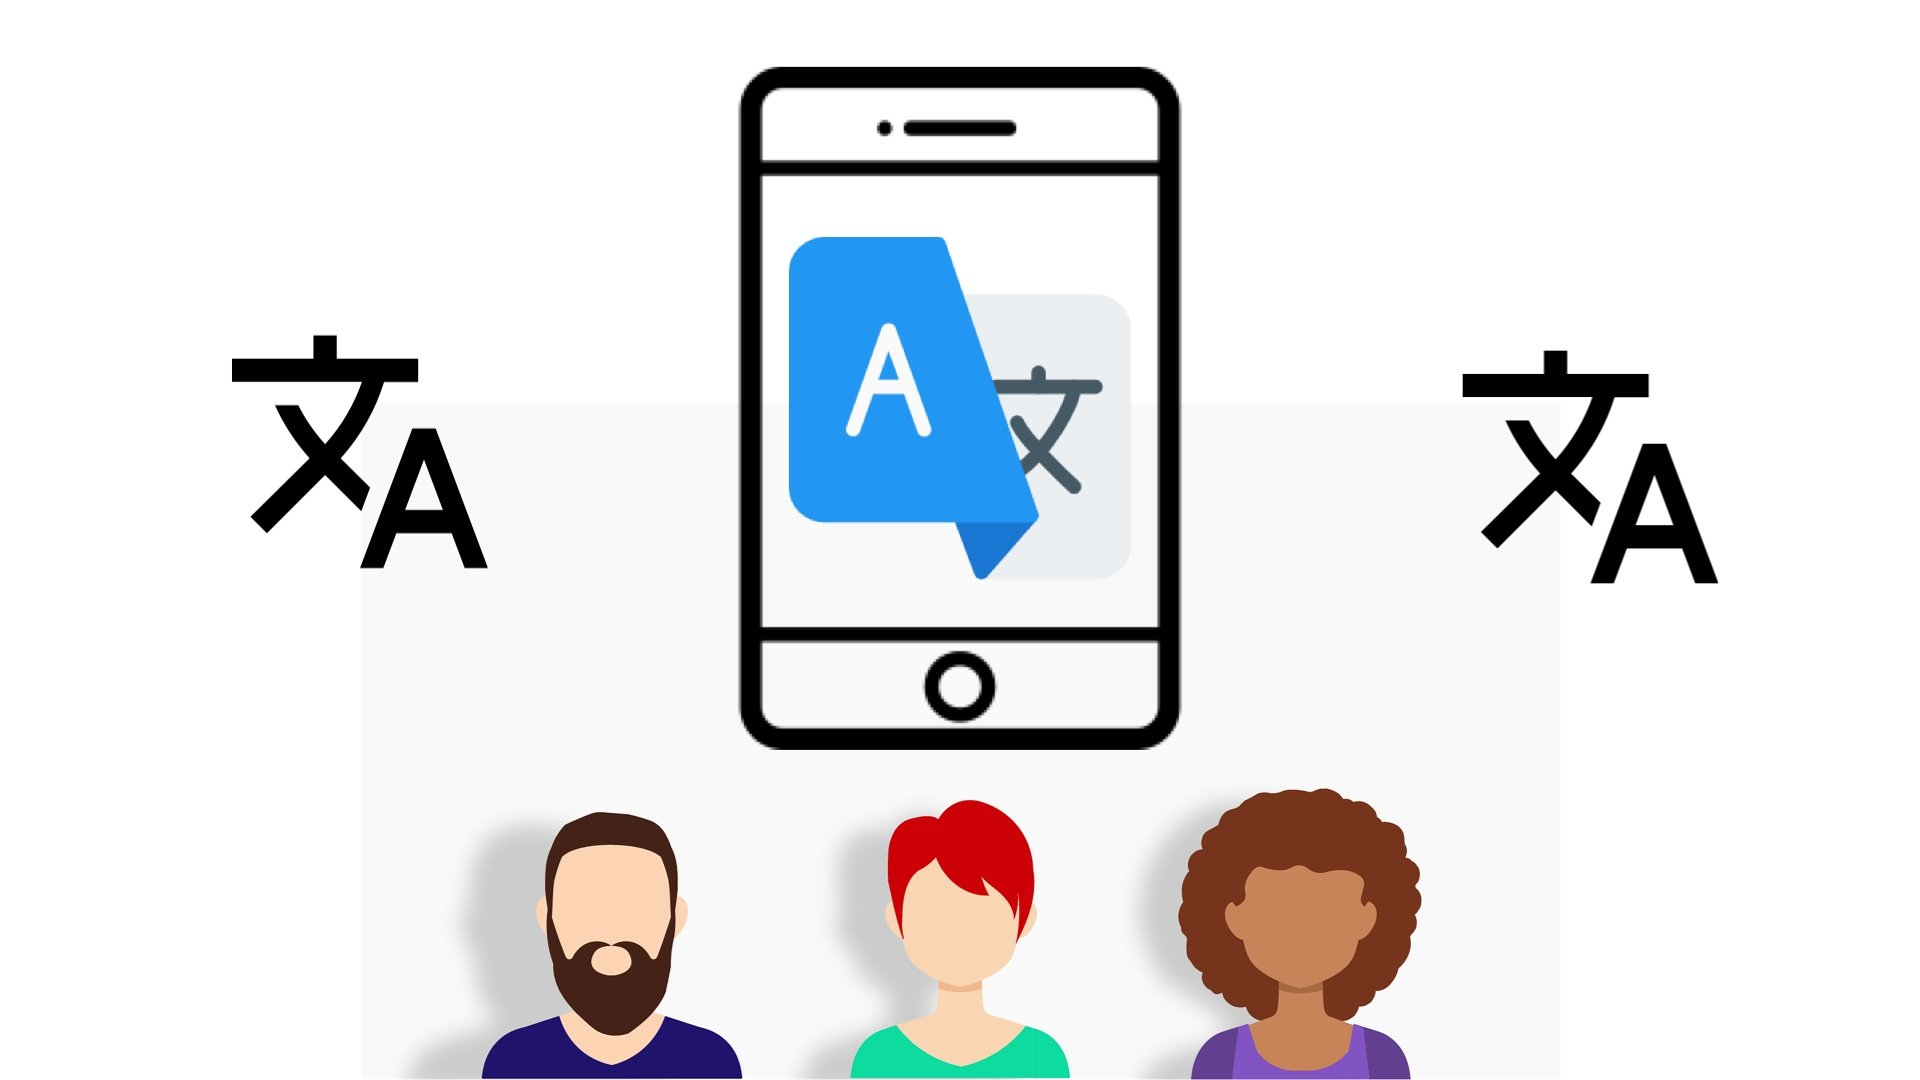 Create a translator app using MIT App Inventor 2